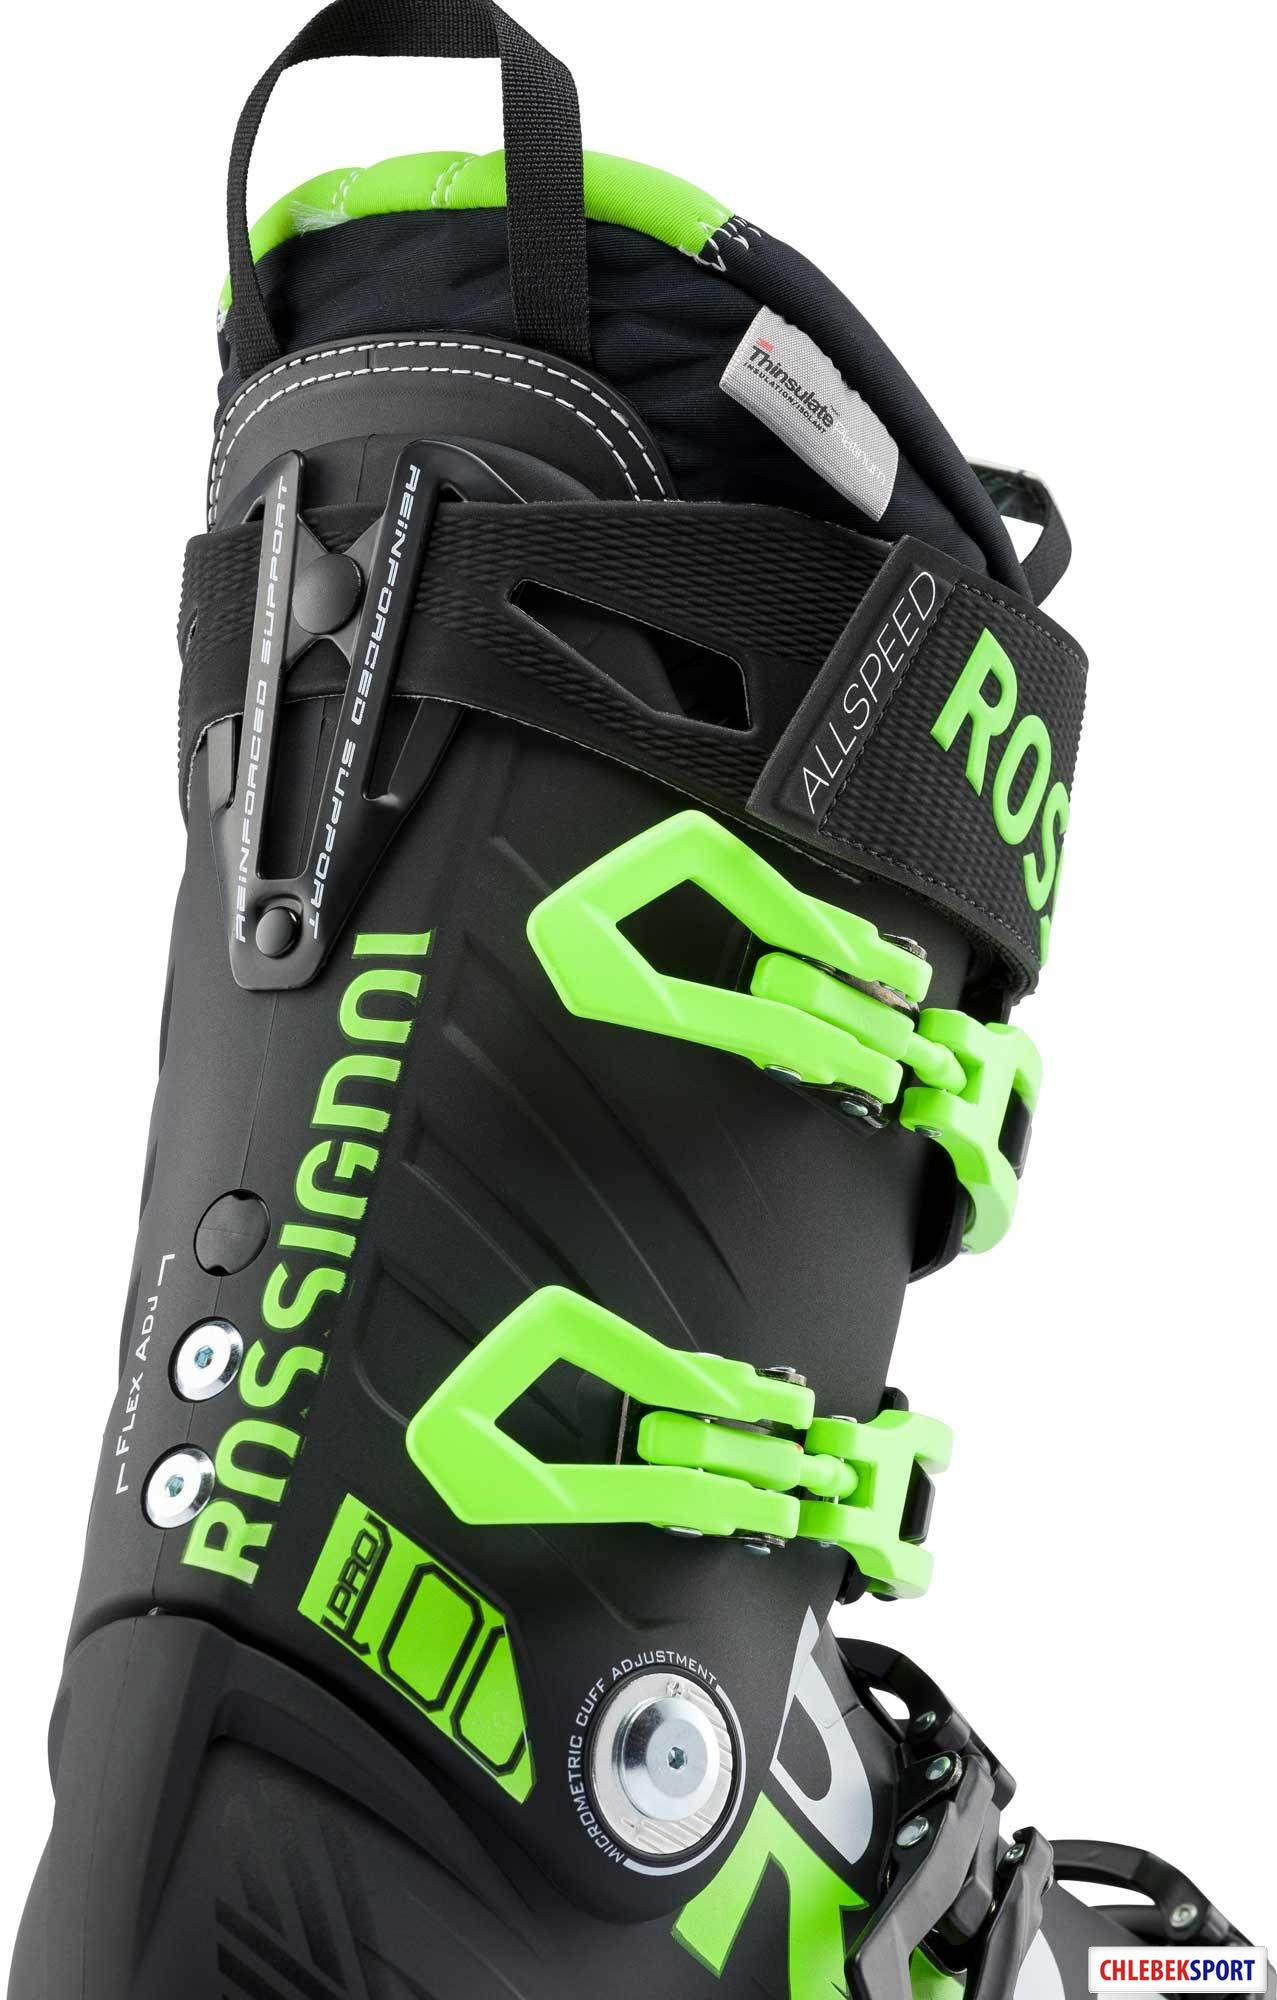 Buty narciarskie Rossignol AllSpeed Pro 100 BlackGreen 2020